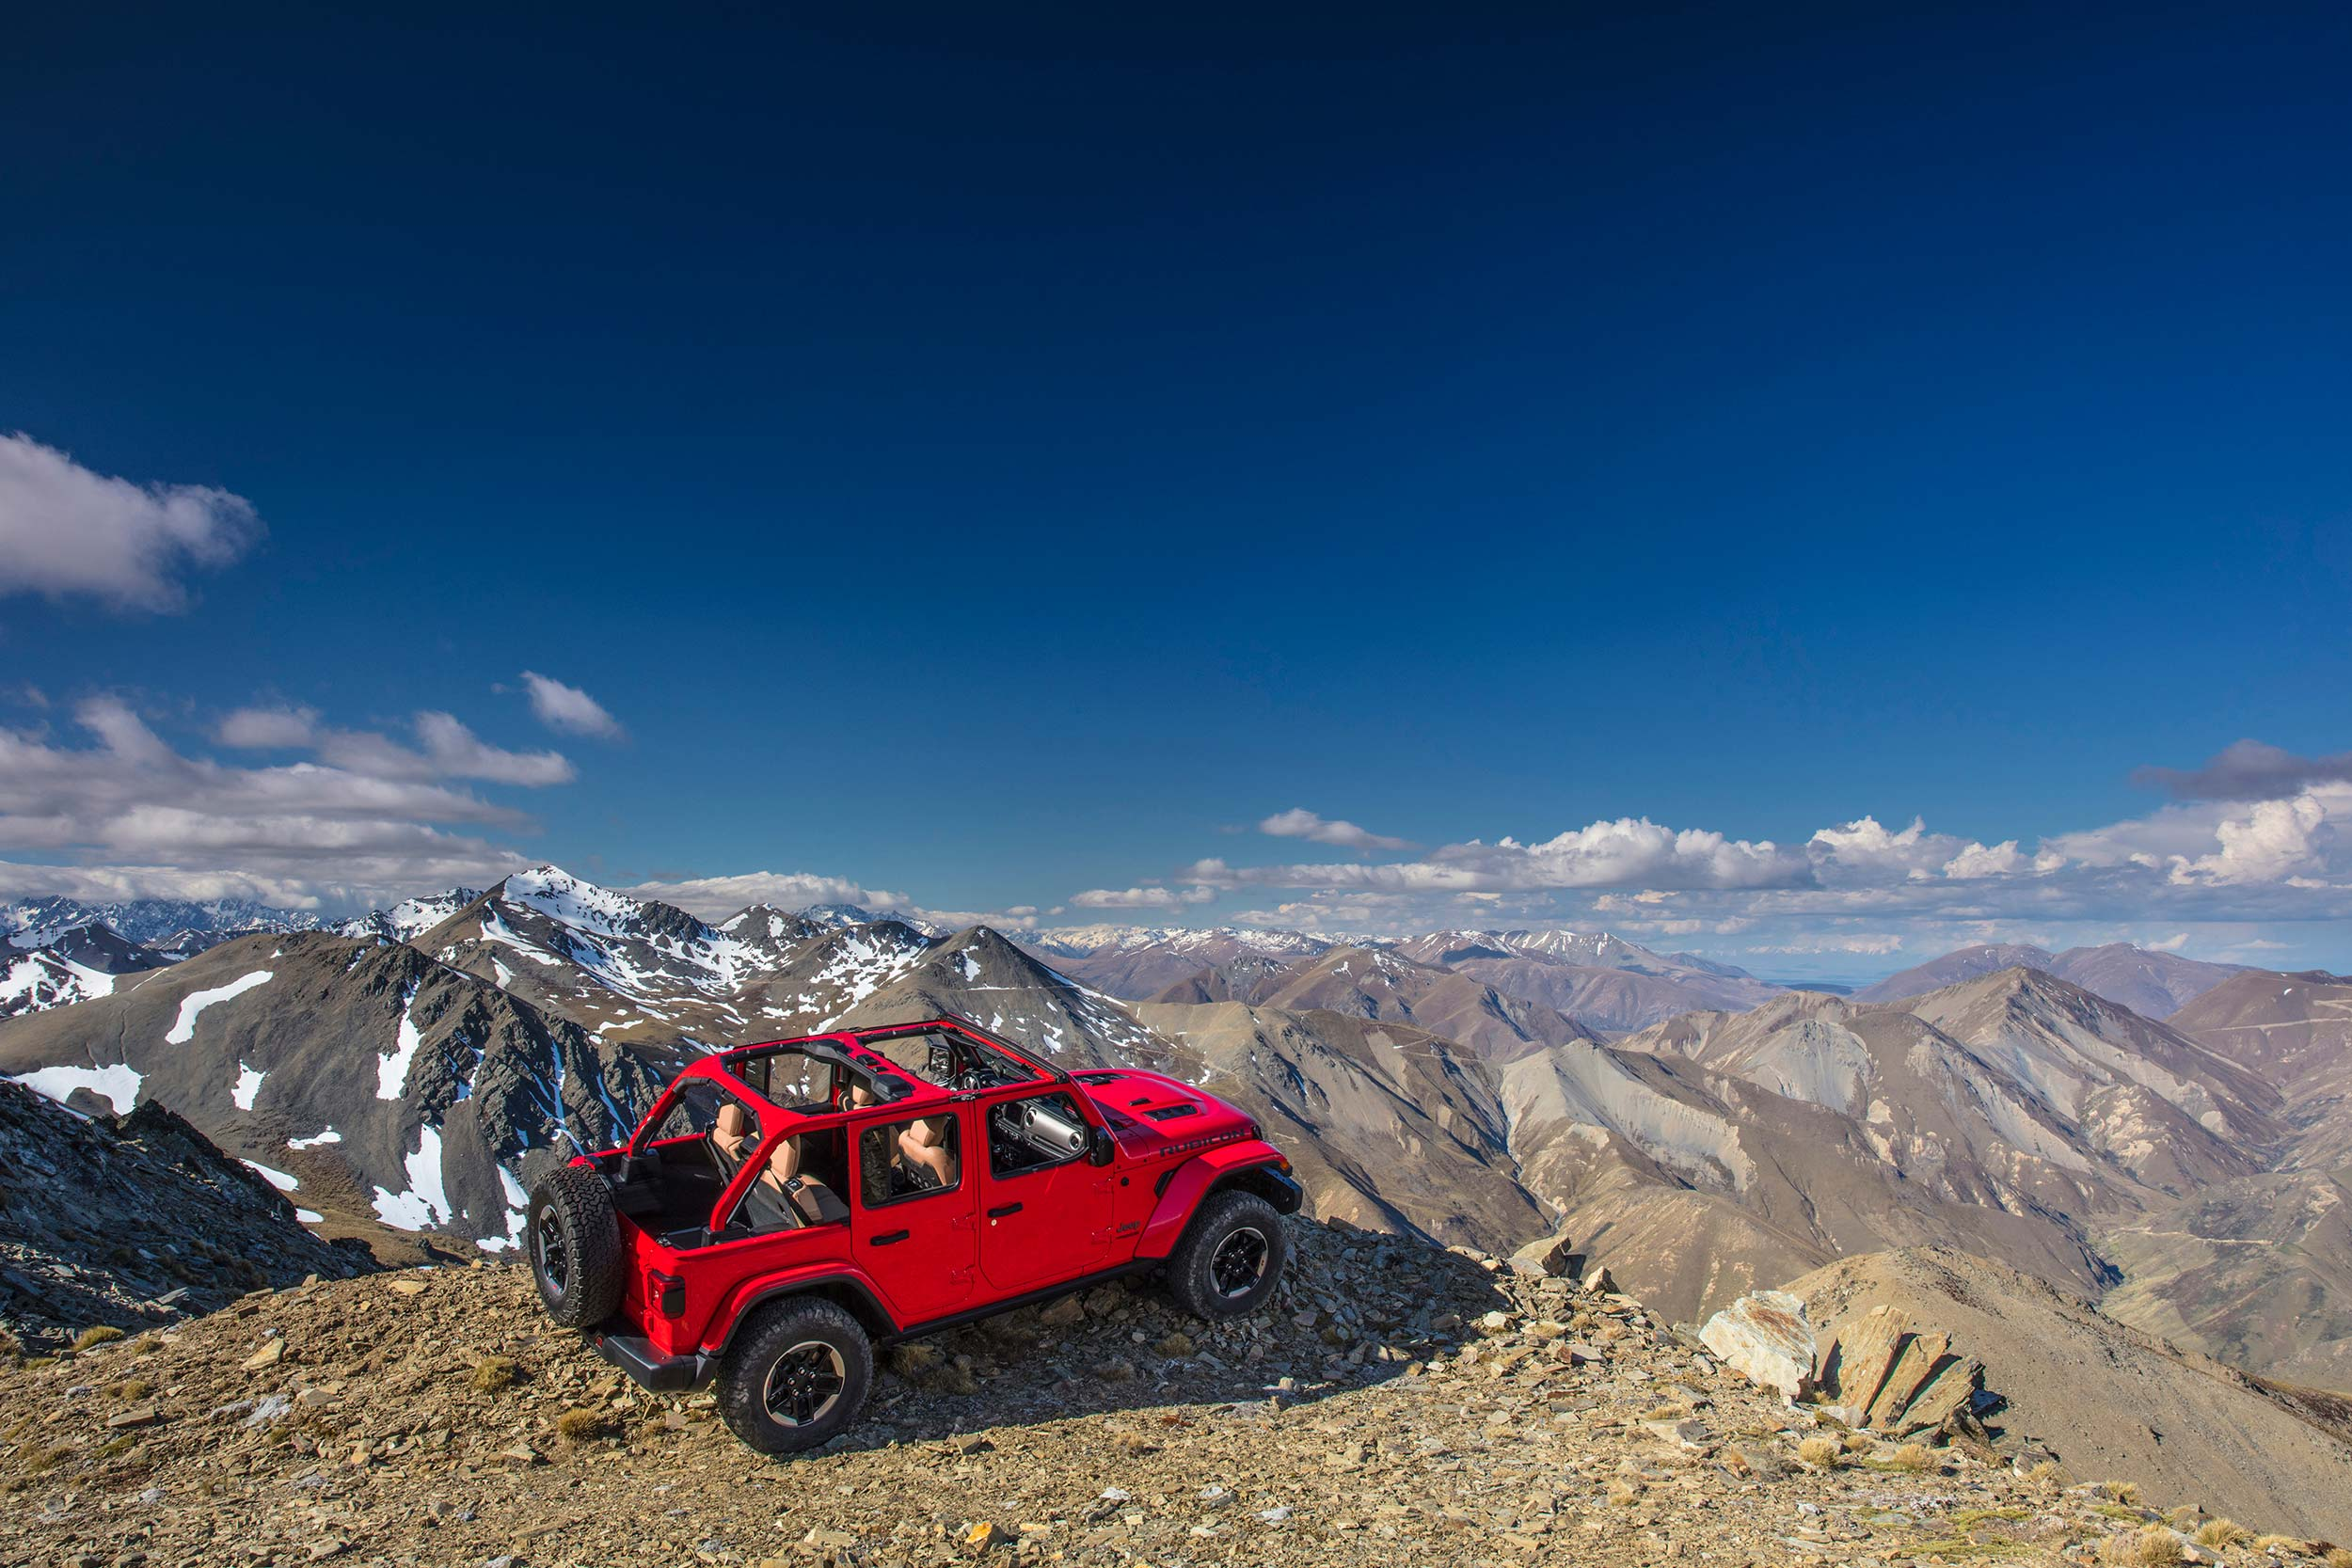 2018 Jeep Wrangler JL Unlimited